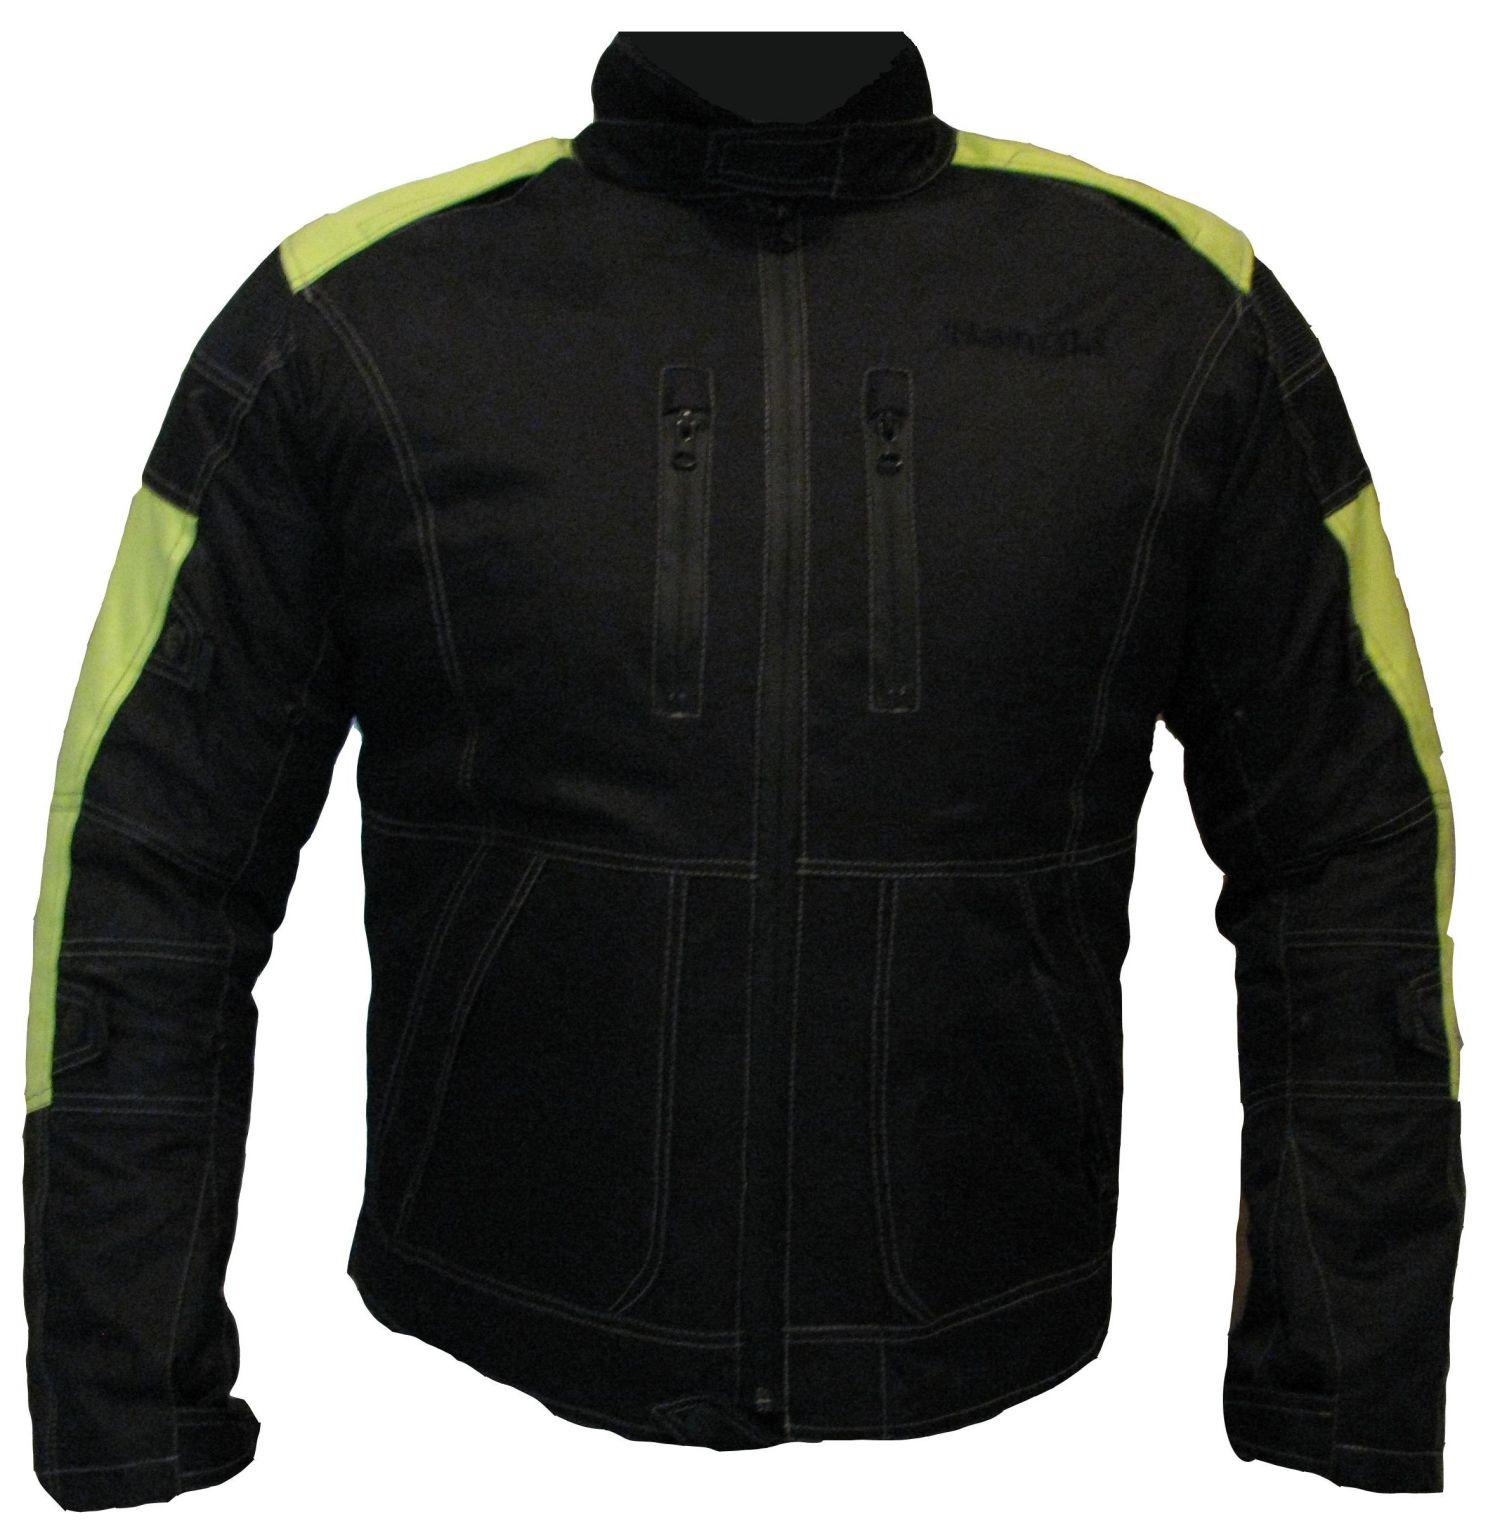 Motorrad Jacke Touren Cordura Motorradjacke Schwarz Neongelb 3XL und XL